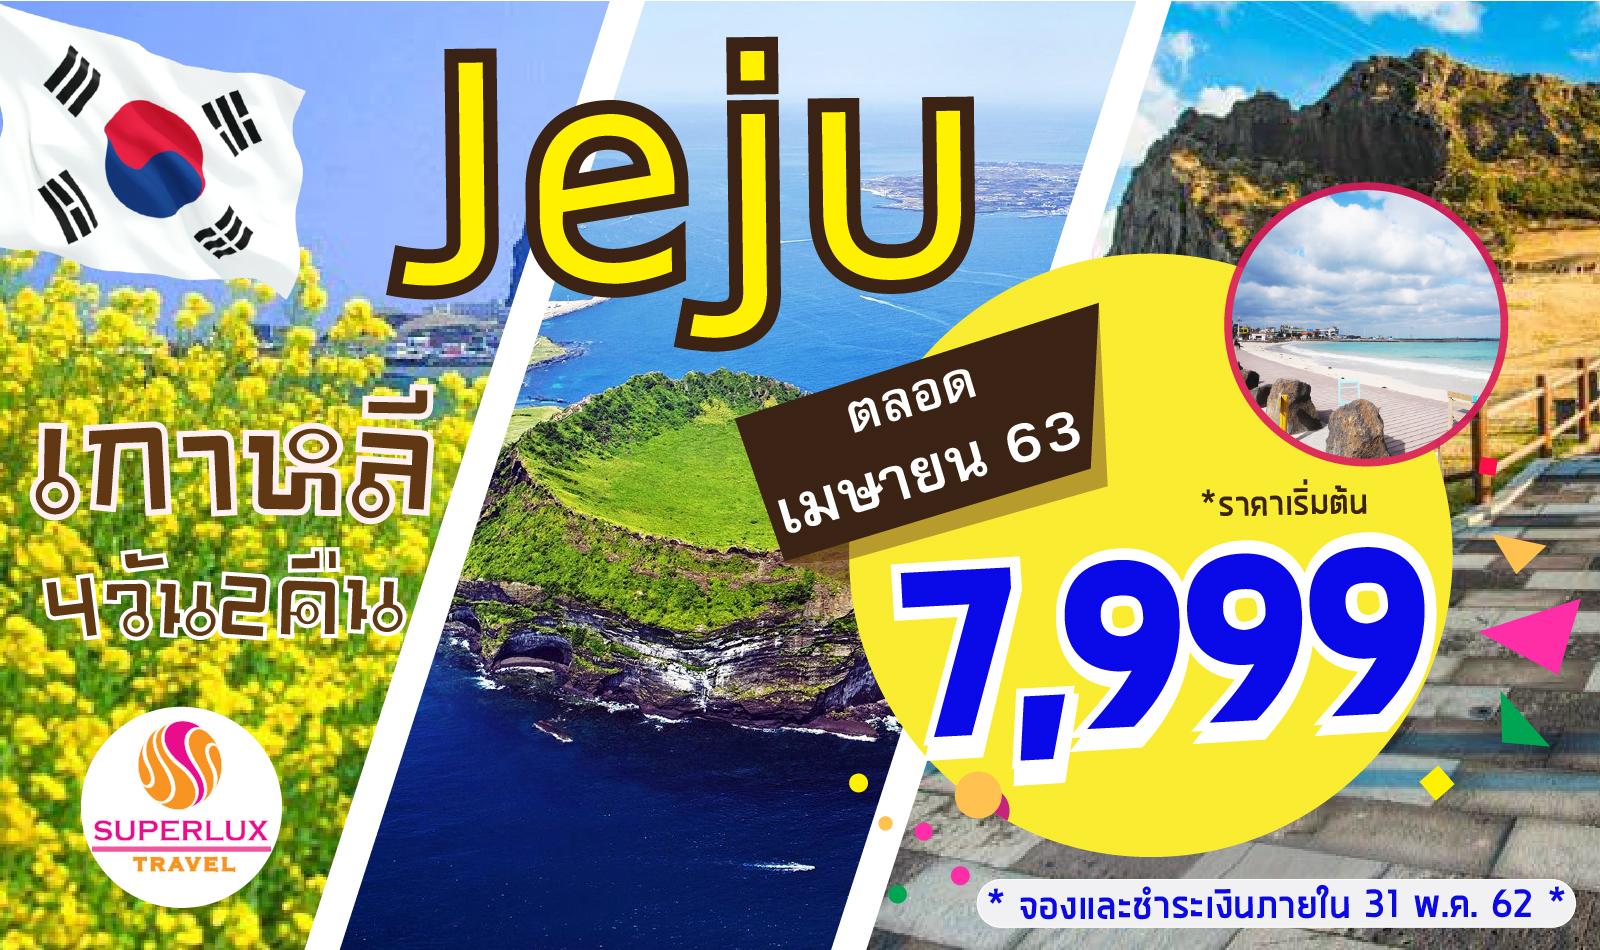 ROMANTIC JEJU IN APRIL ทัวร์เกาหลี เกาะเชจู 4D2N